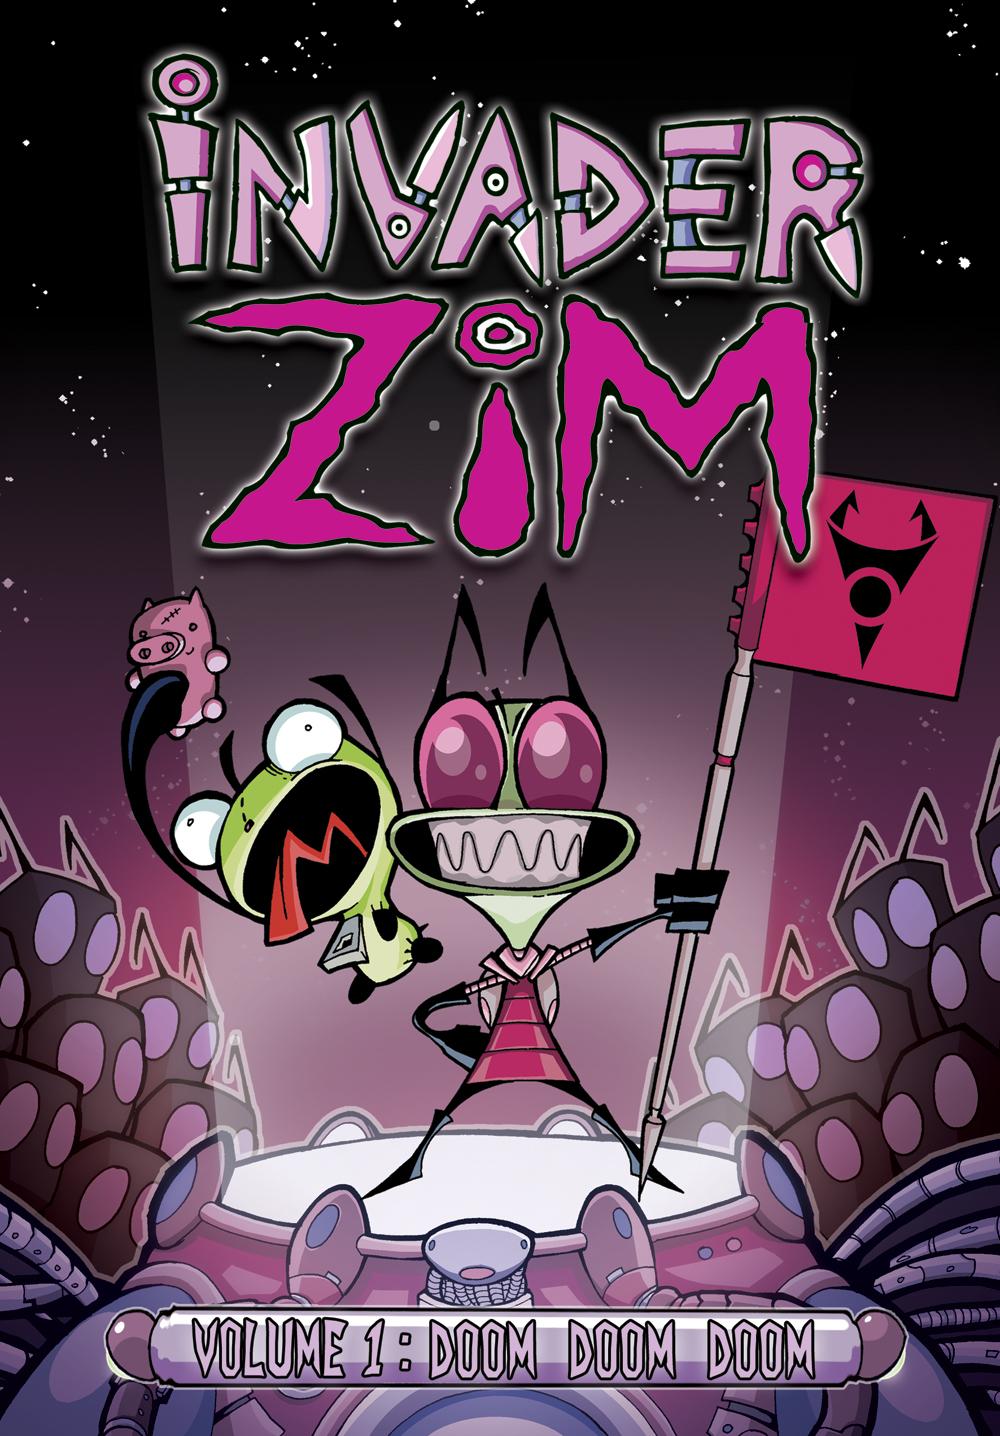 Invader Zim DVD volume 1